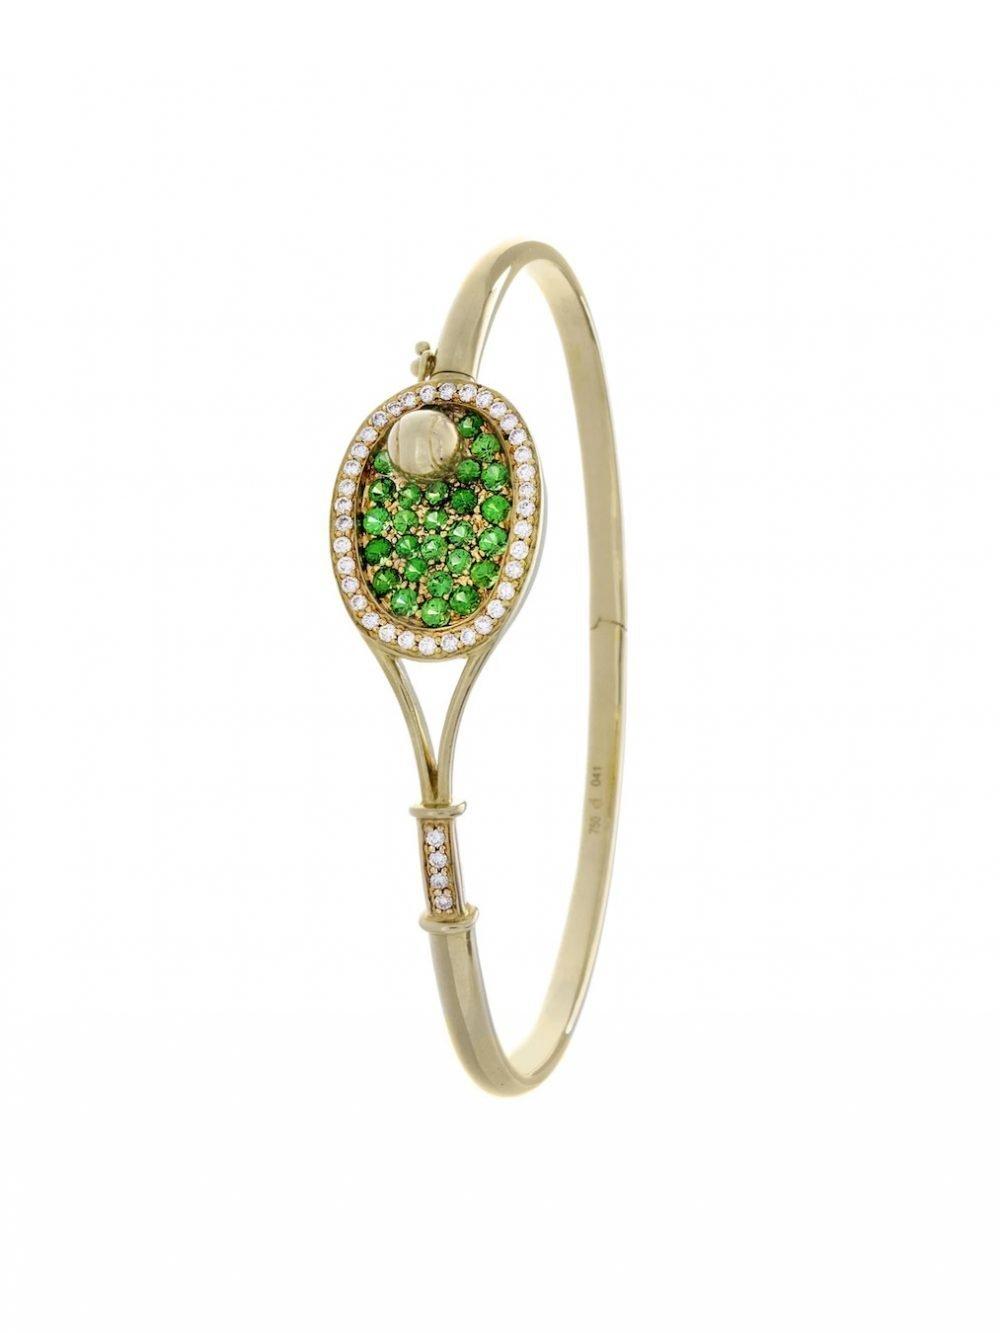 Racket-shaped tennis bracelet & tennis ball (18K solid yellow gold with 25 tsavorite gemstones and 40 diamonds)